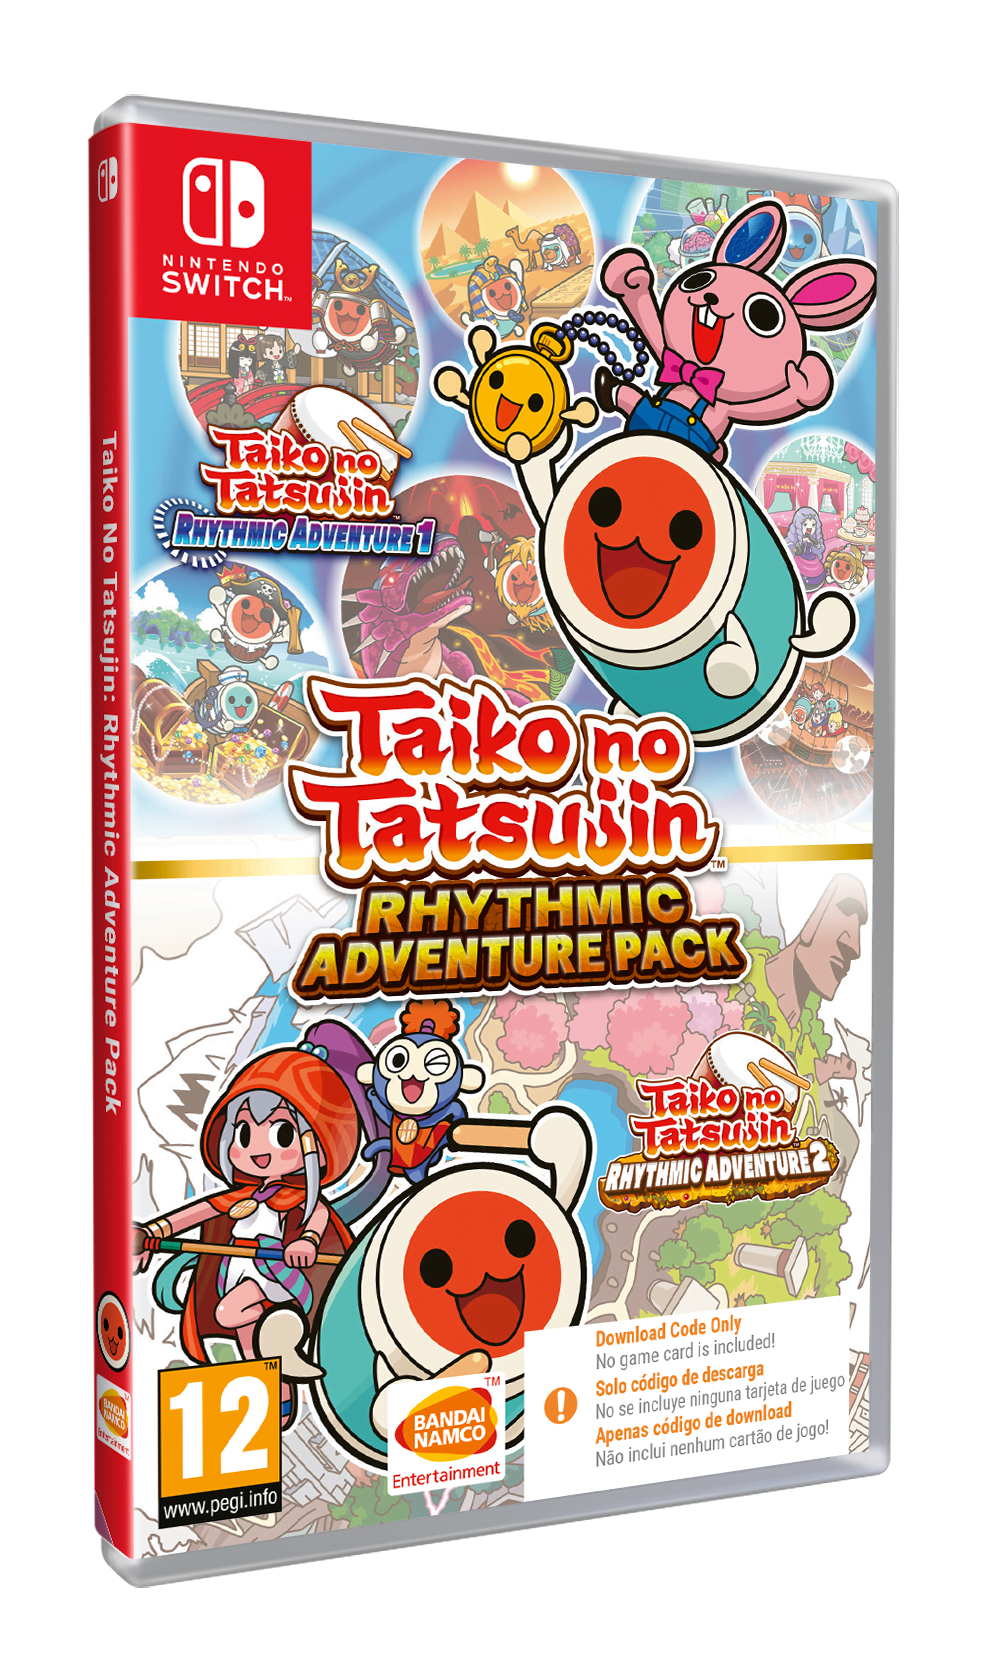 Taiko no Tatsujin: Rhythmic Adventure Pack (CIAB) (Nintendo Switch)